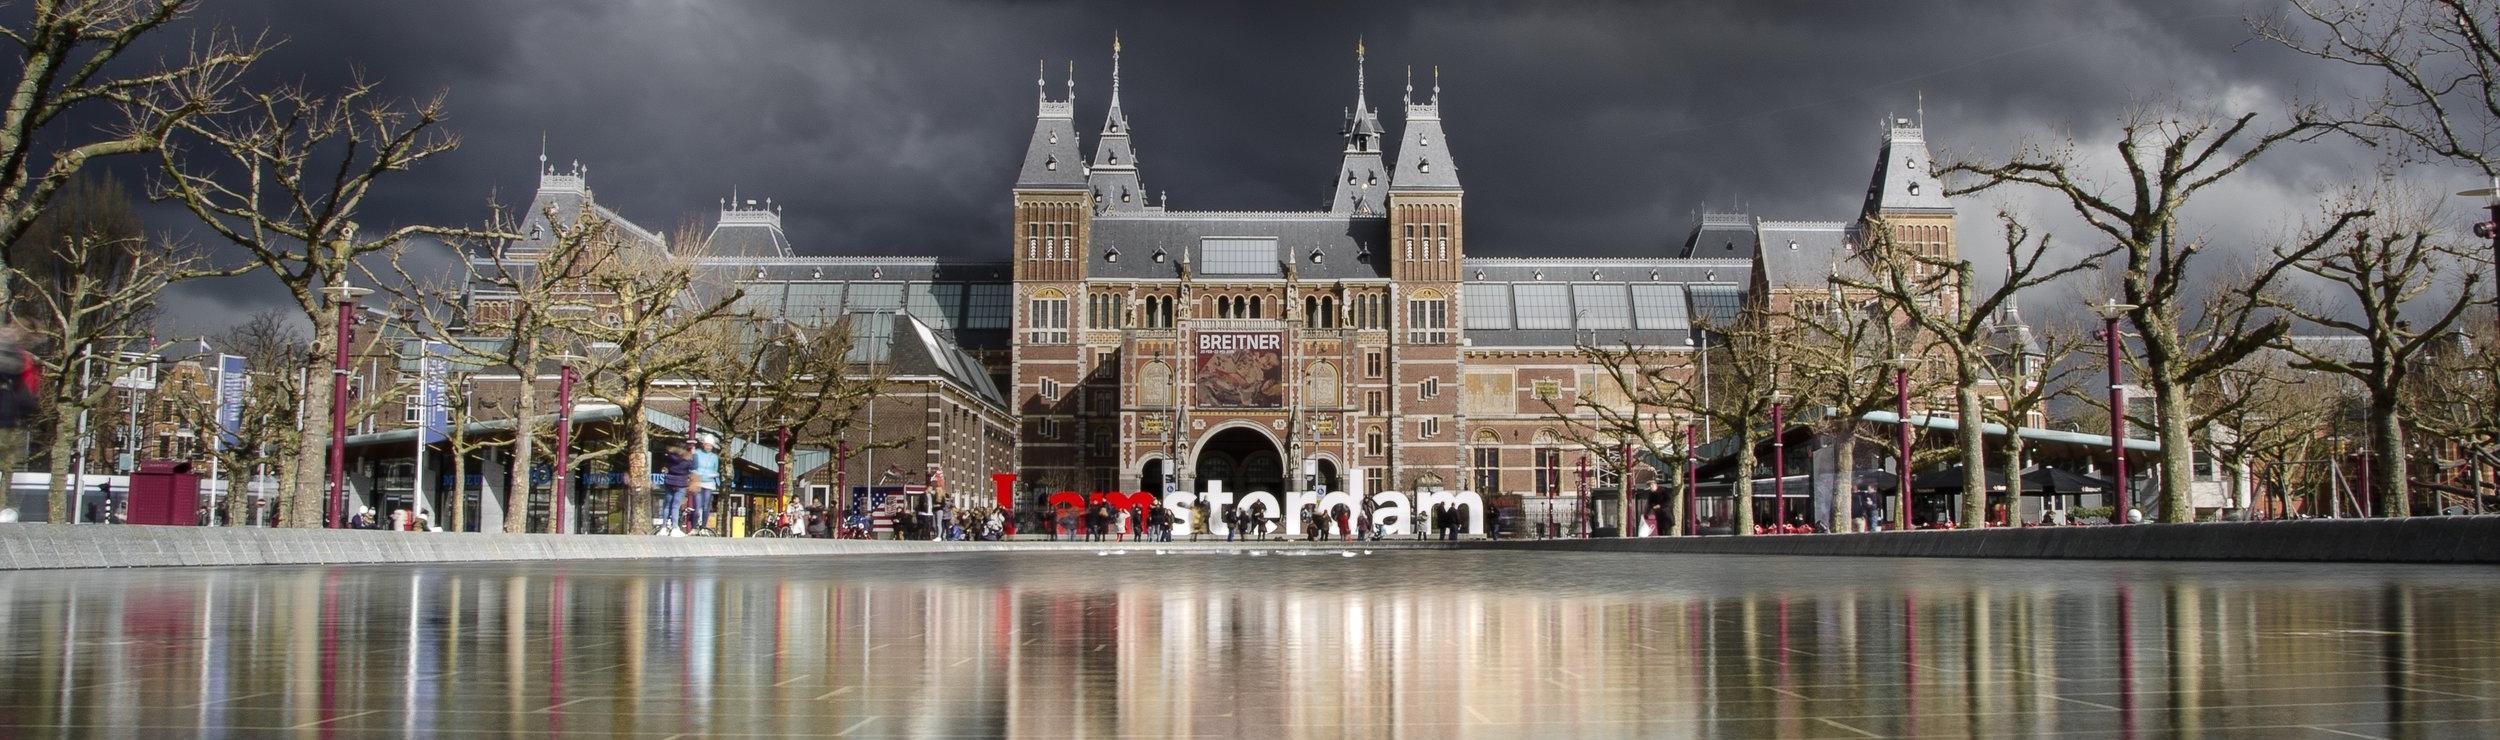 amsterdam-architecture-building-60247.jpg